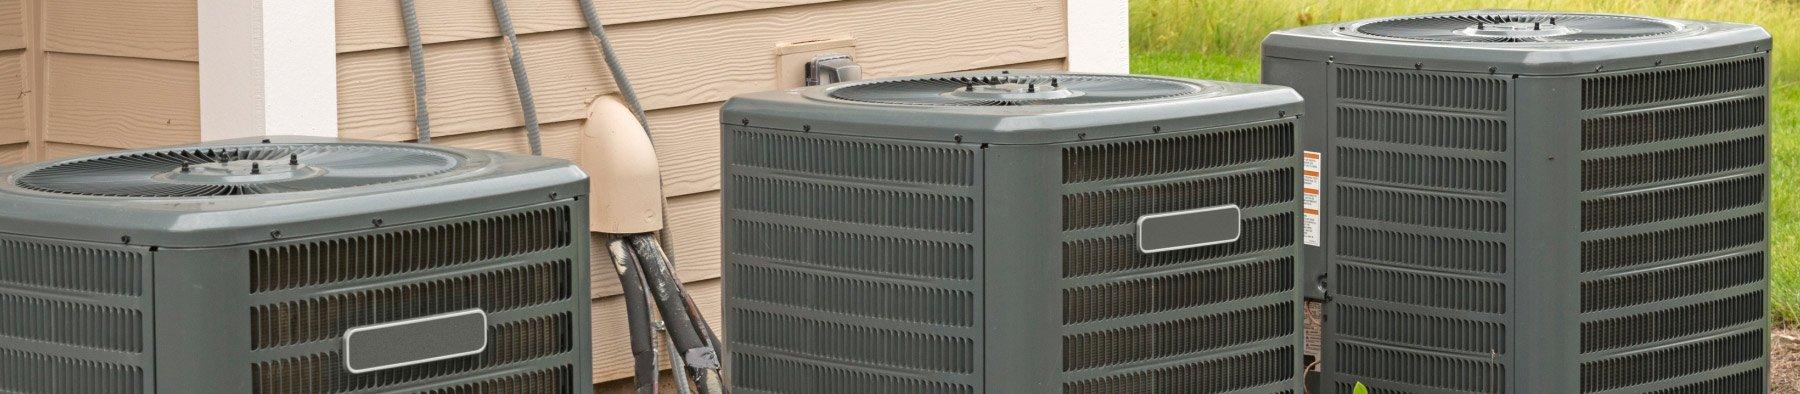 San Francisco Air Conditioning Repair